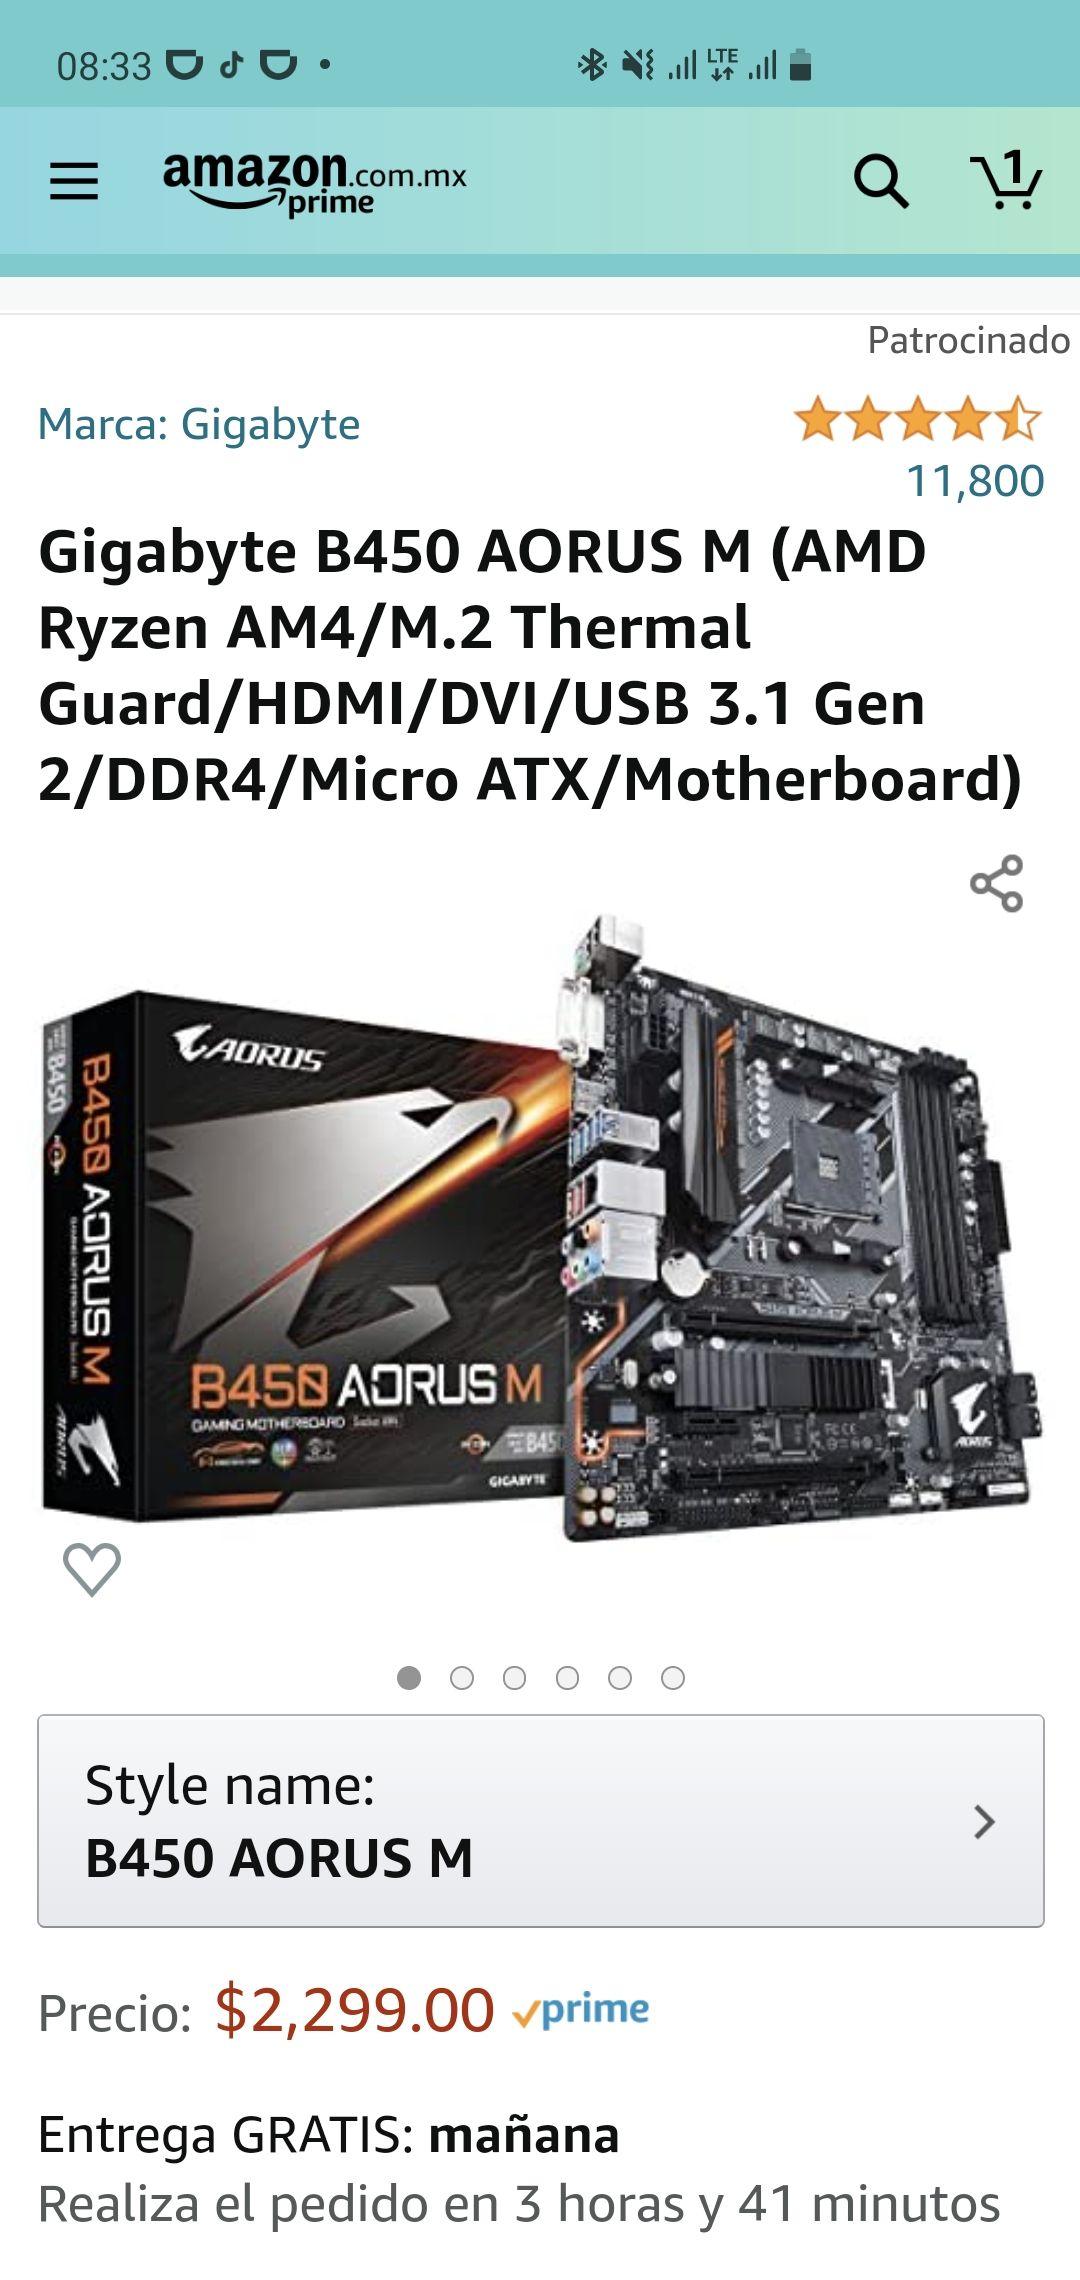 Amazon: Gigabyte B450 AORUS M (AMD Ryzen AM4)